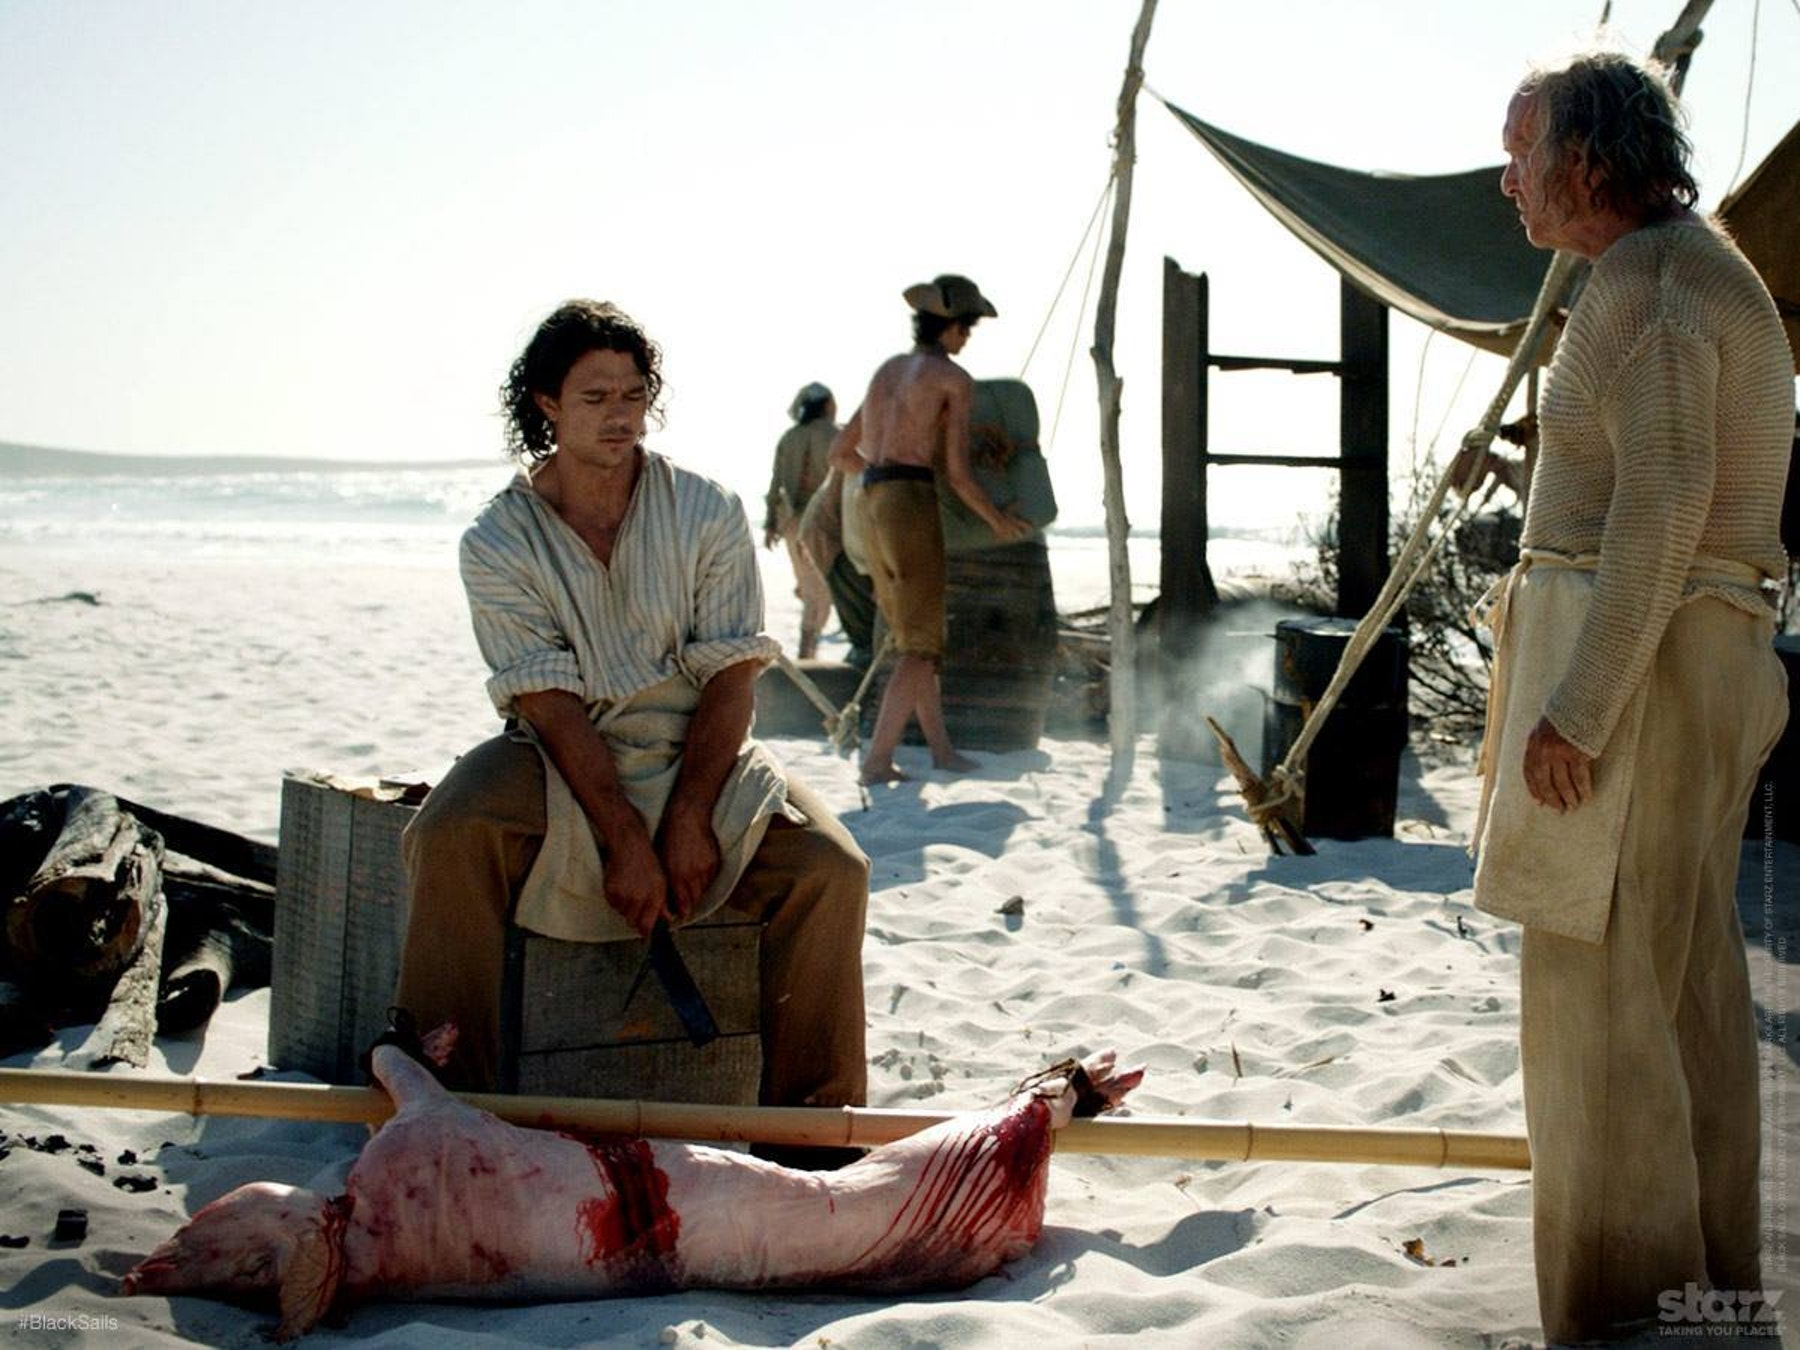 Ah, simpler times. John Silver in Season 1